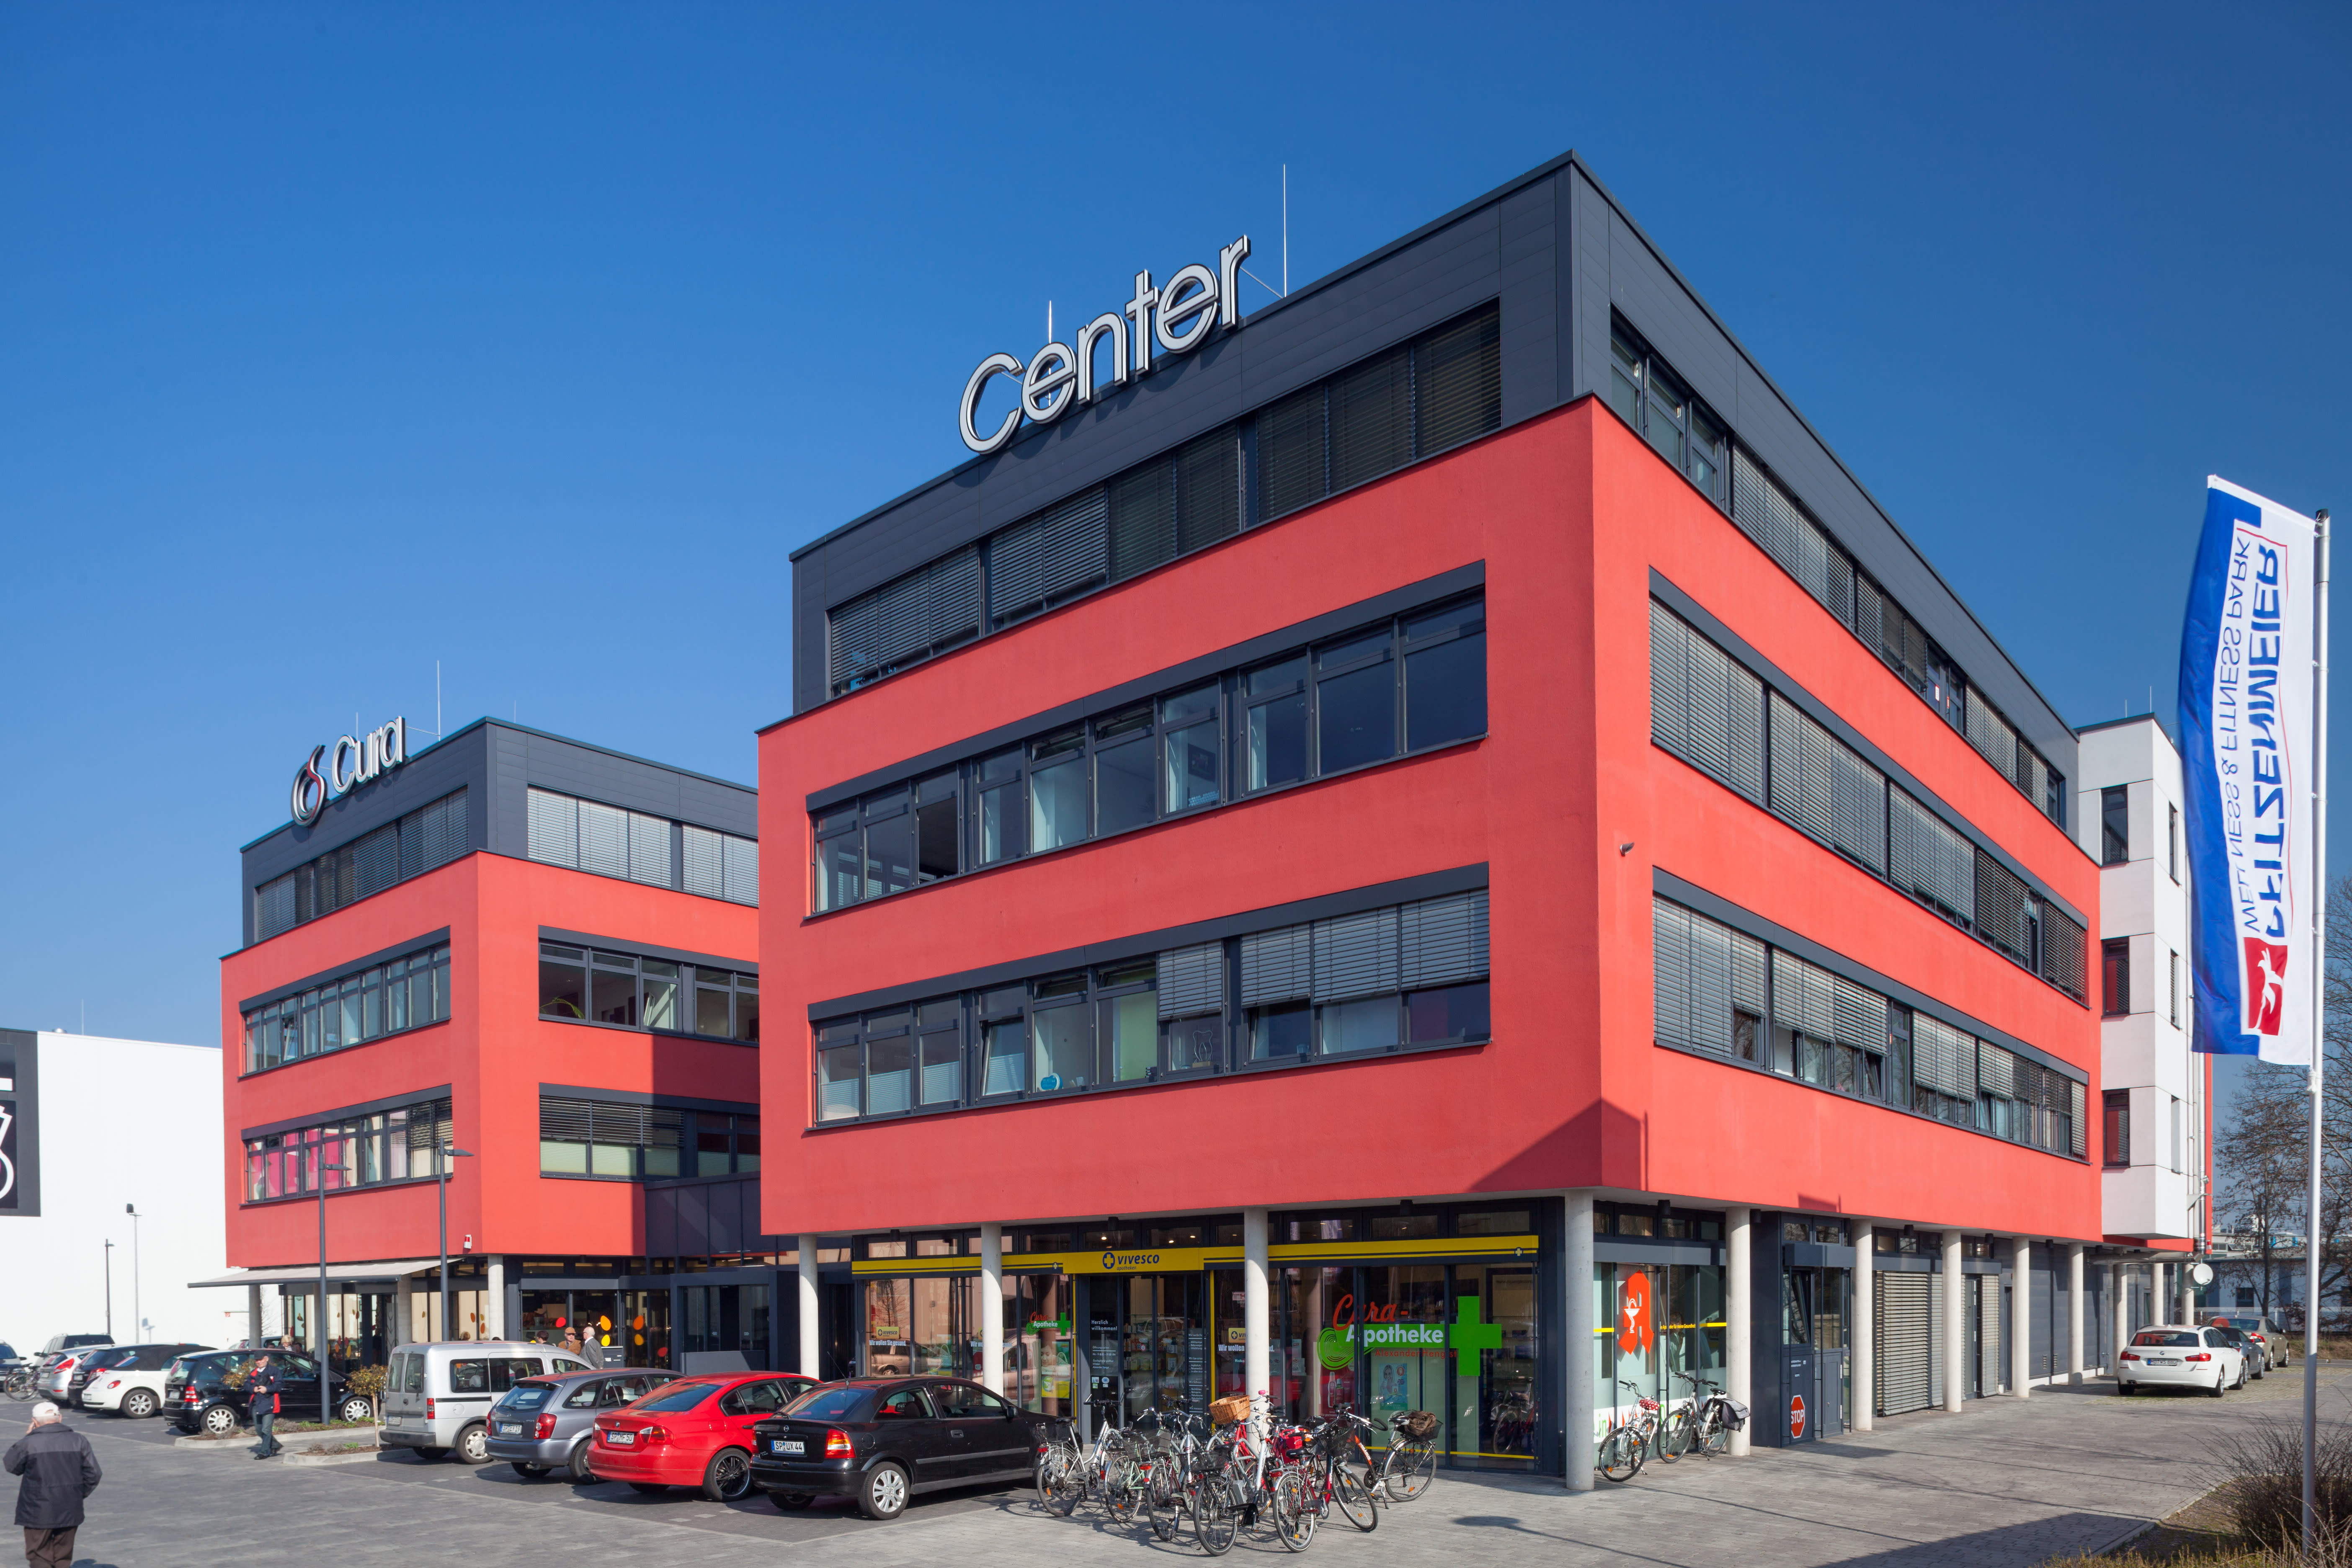 Cura Apotheke Speyer Cura Center Speyer